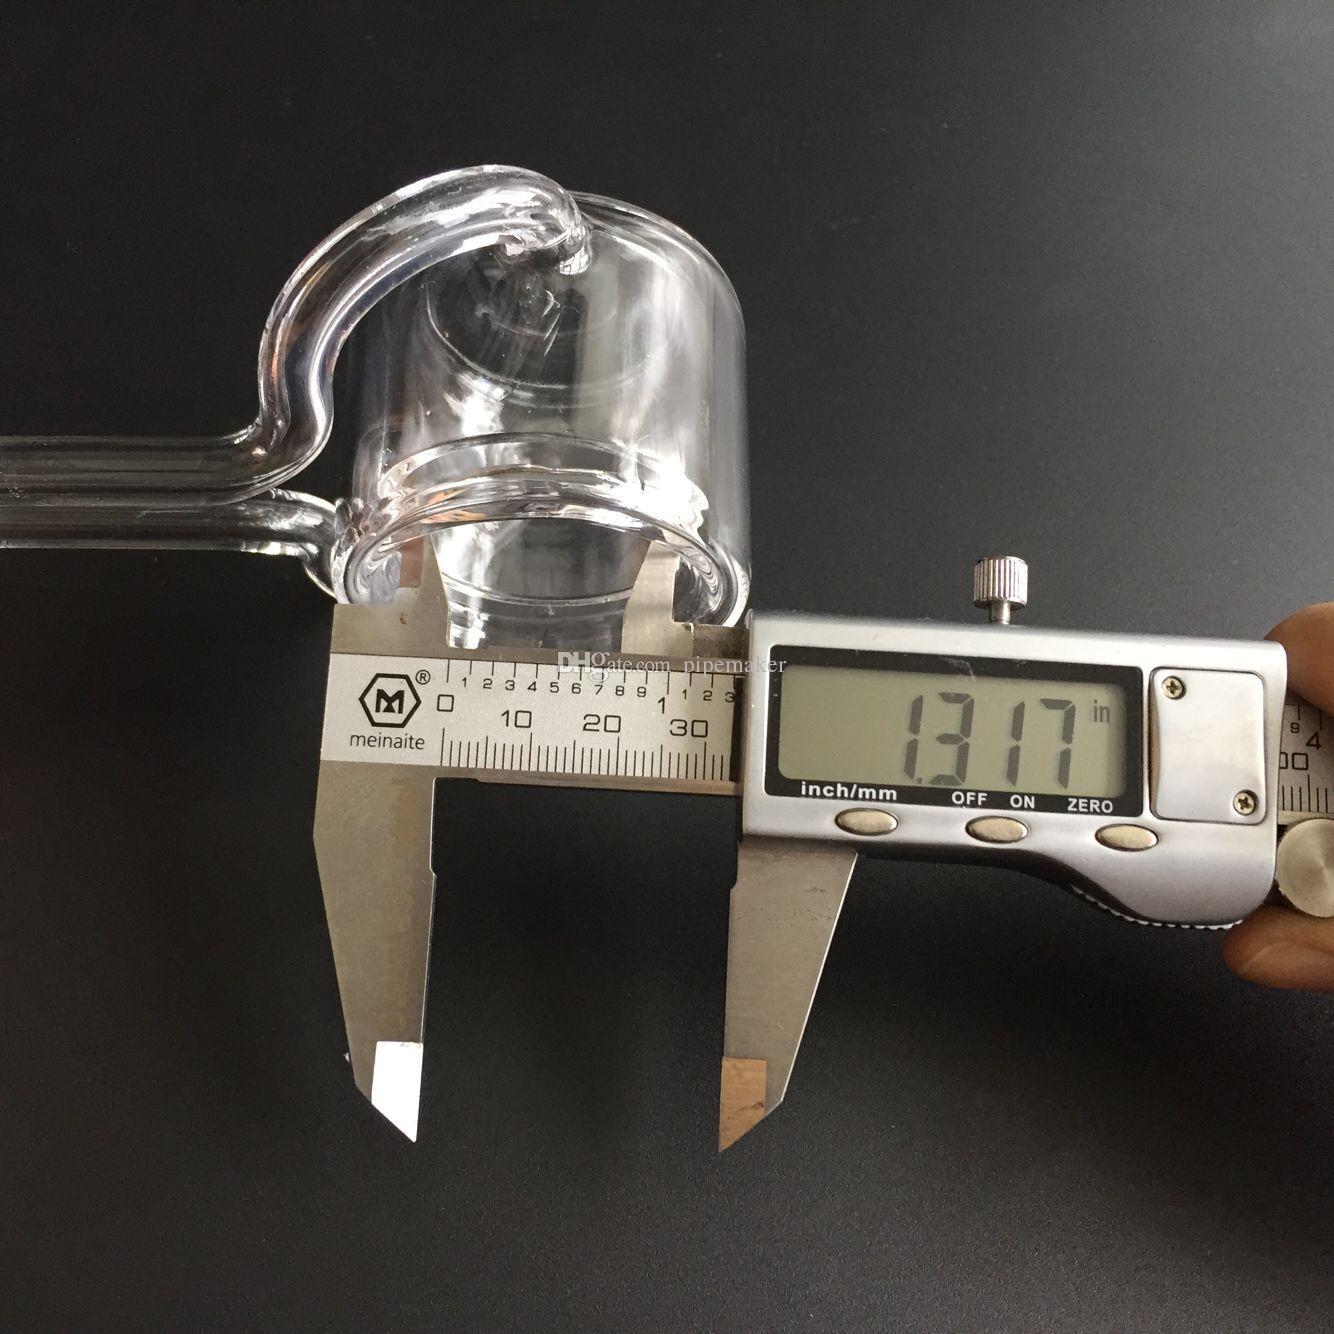 XXL Kuvars Termal Banger kuvars karbonhidrat kap 50mm OD 14mm 18mm Çift Tüp Için Kuvars Termal Banger Petrol Kuleleri bongs ücretsiz kargo